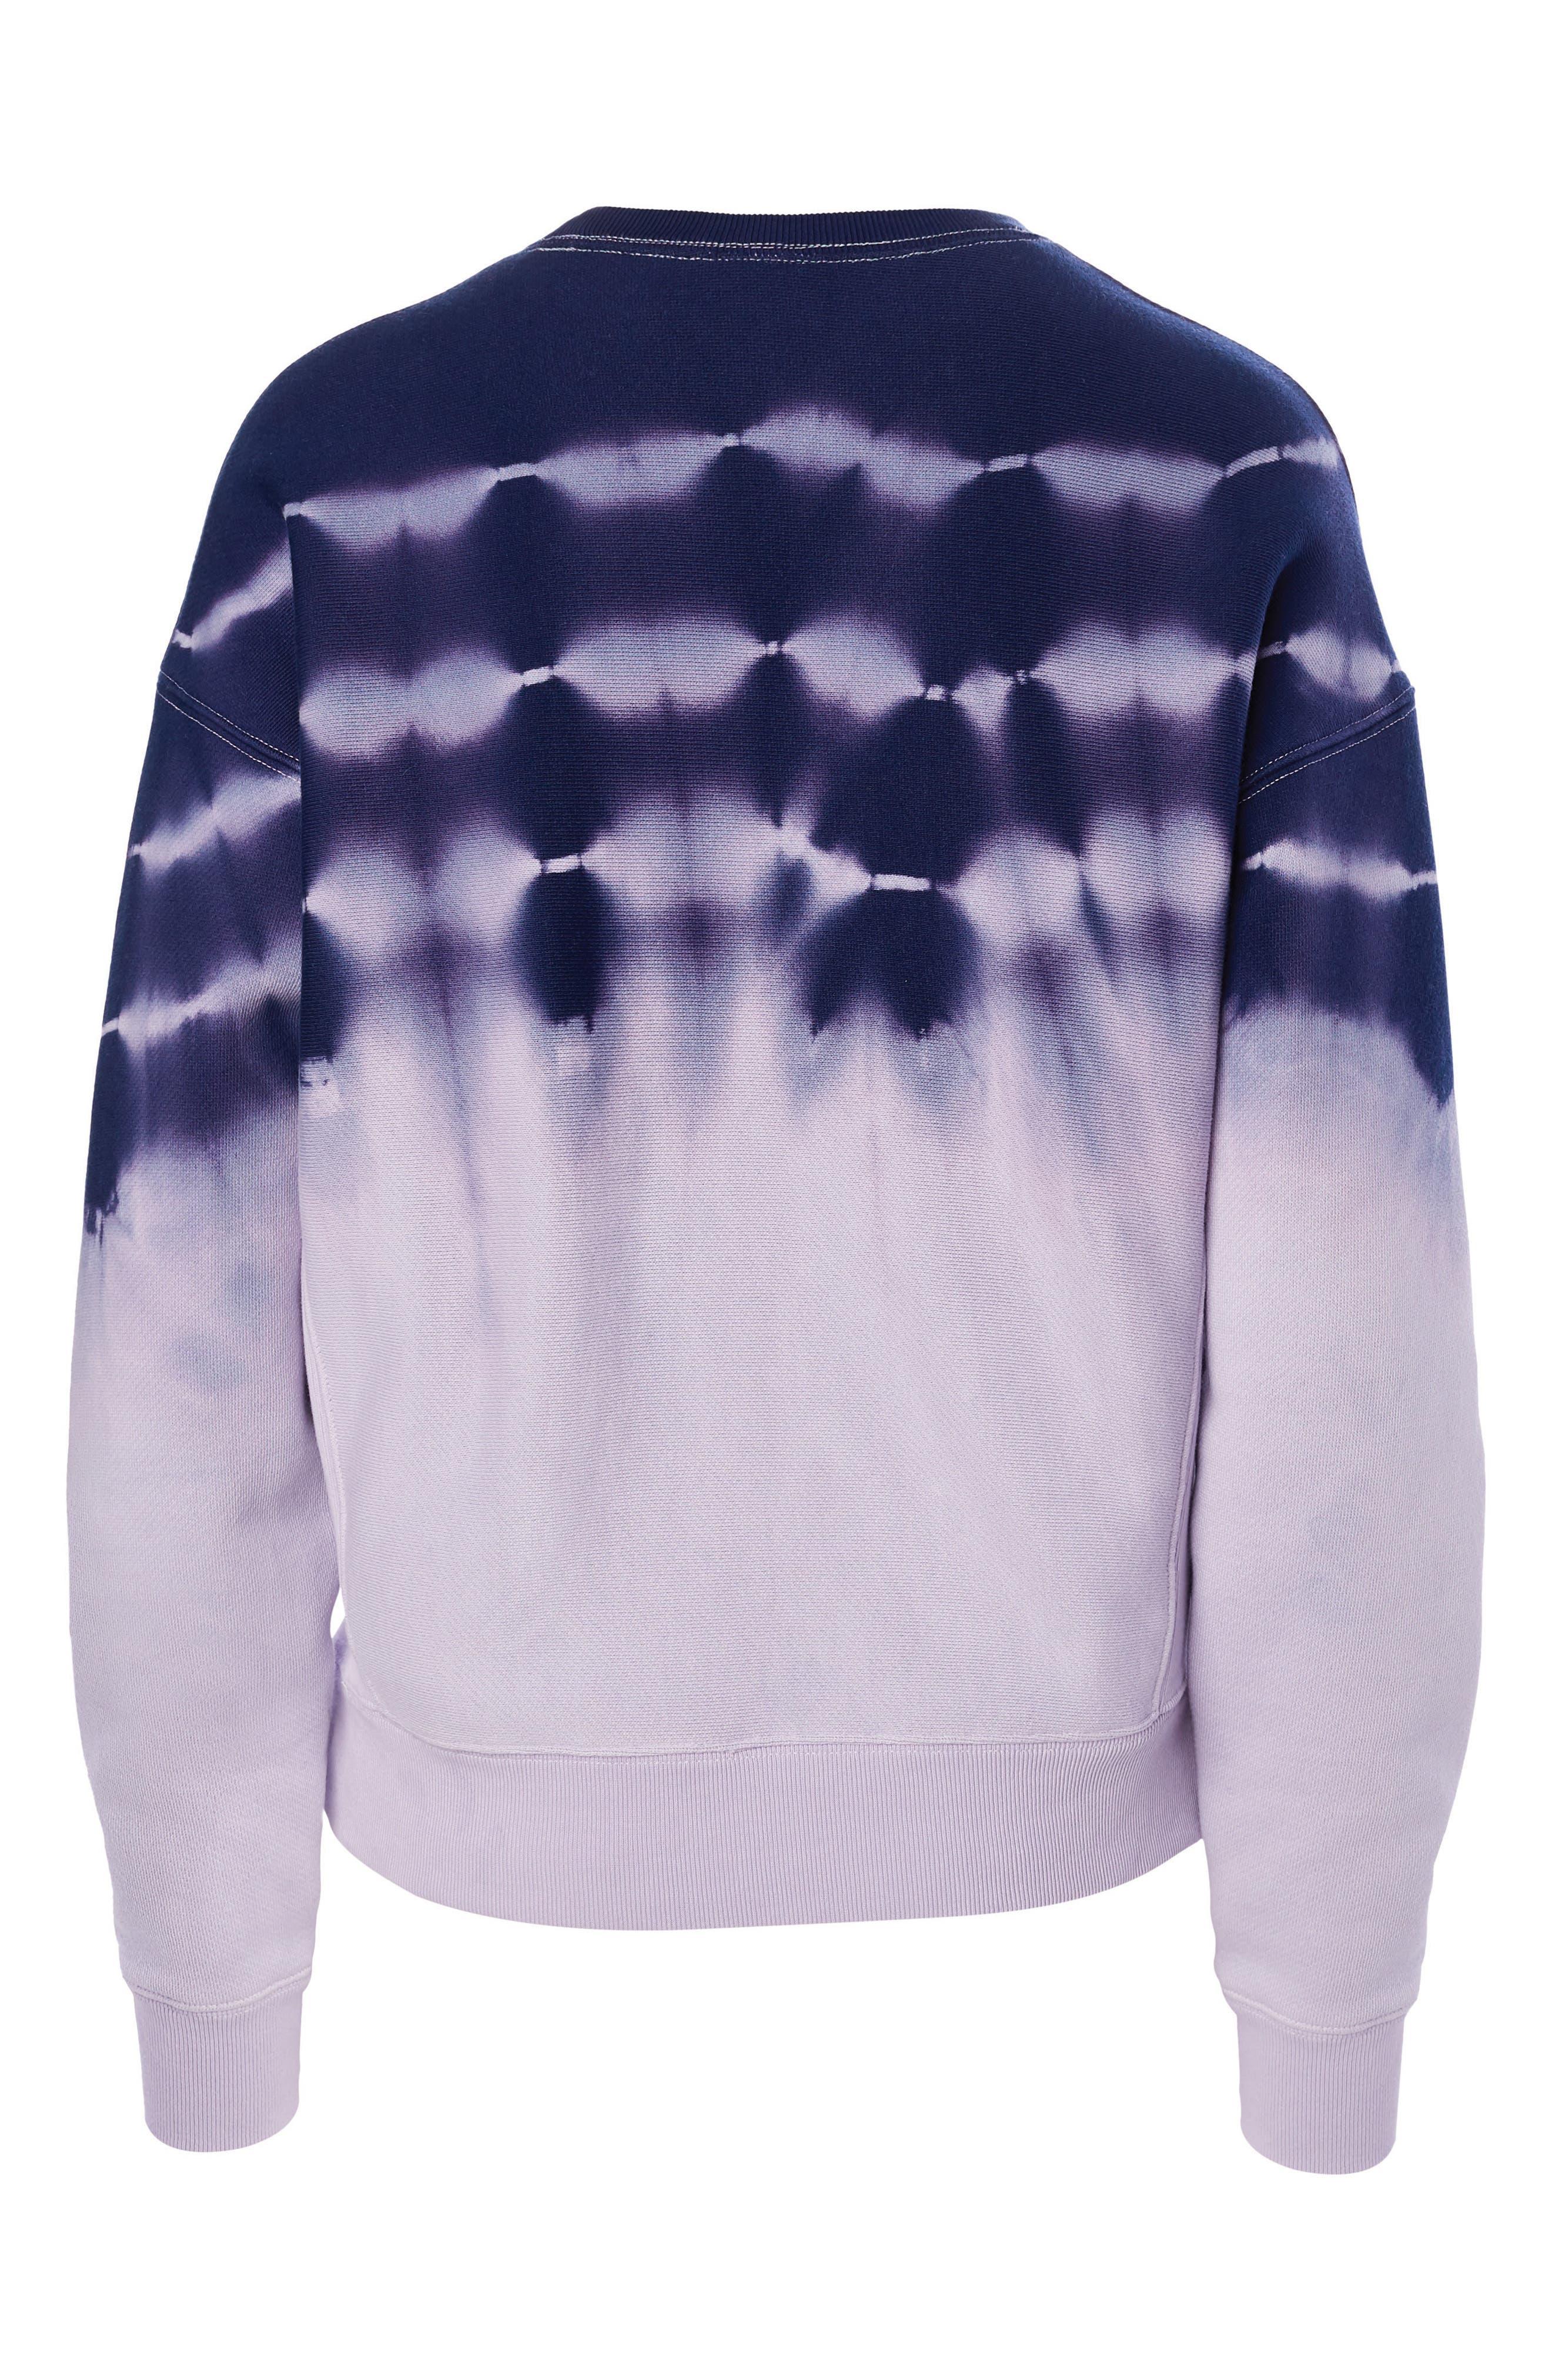 CHAMPION, Streak Dye Sweatshirt, Alternate thumbnail 4, color, PALE VIOLET ROSE